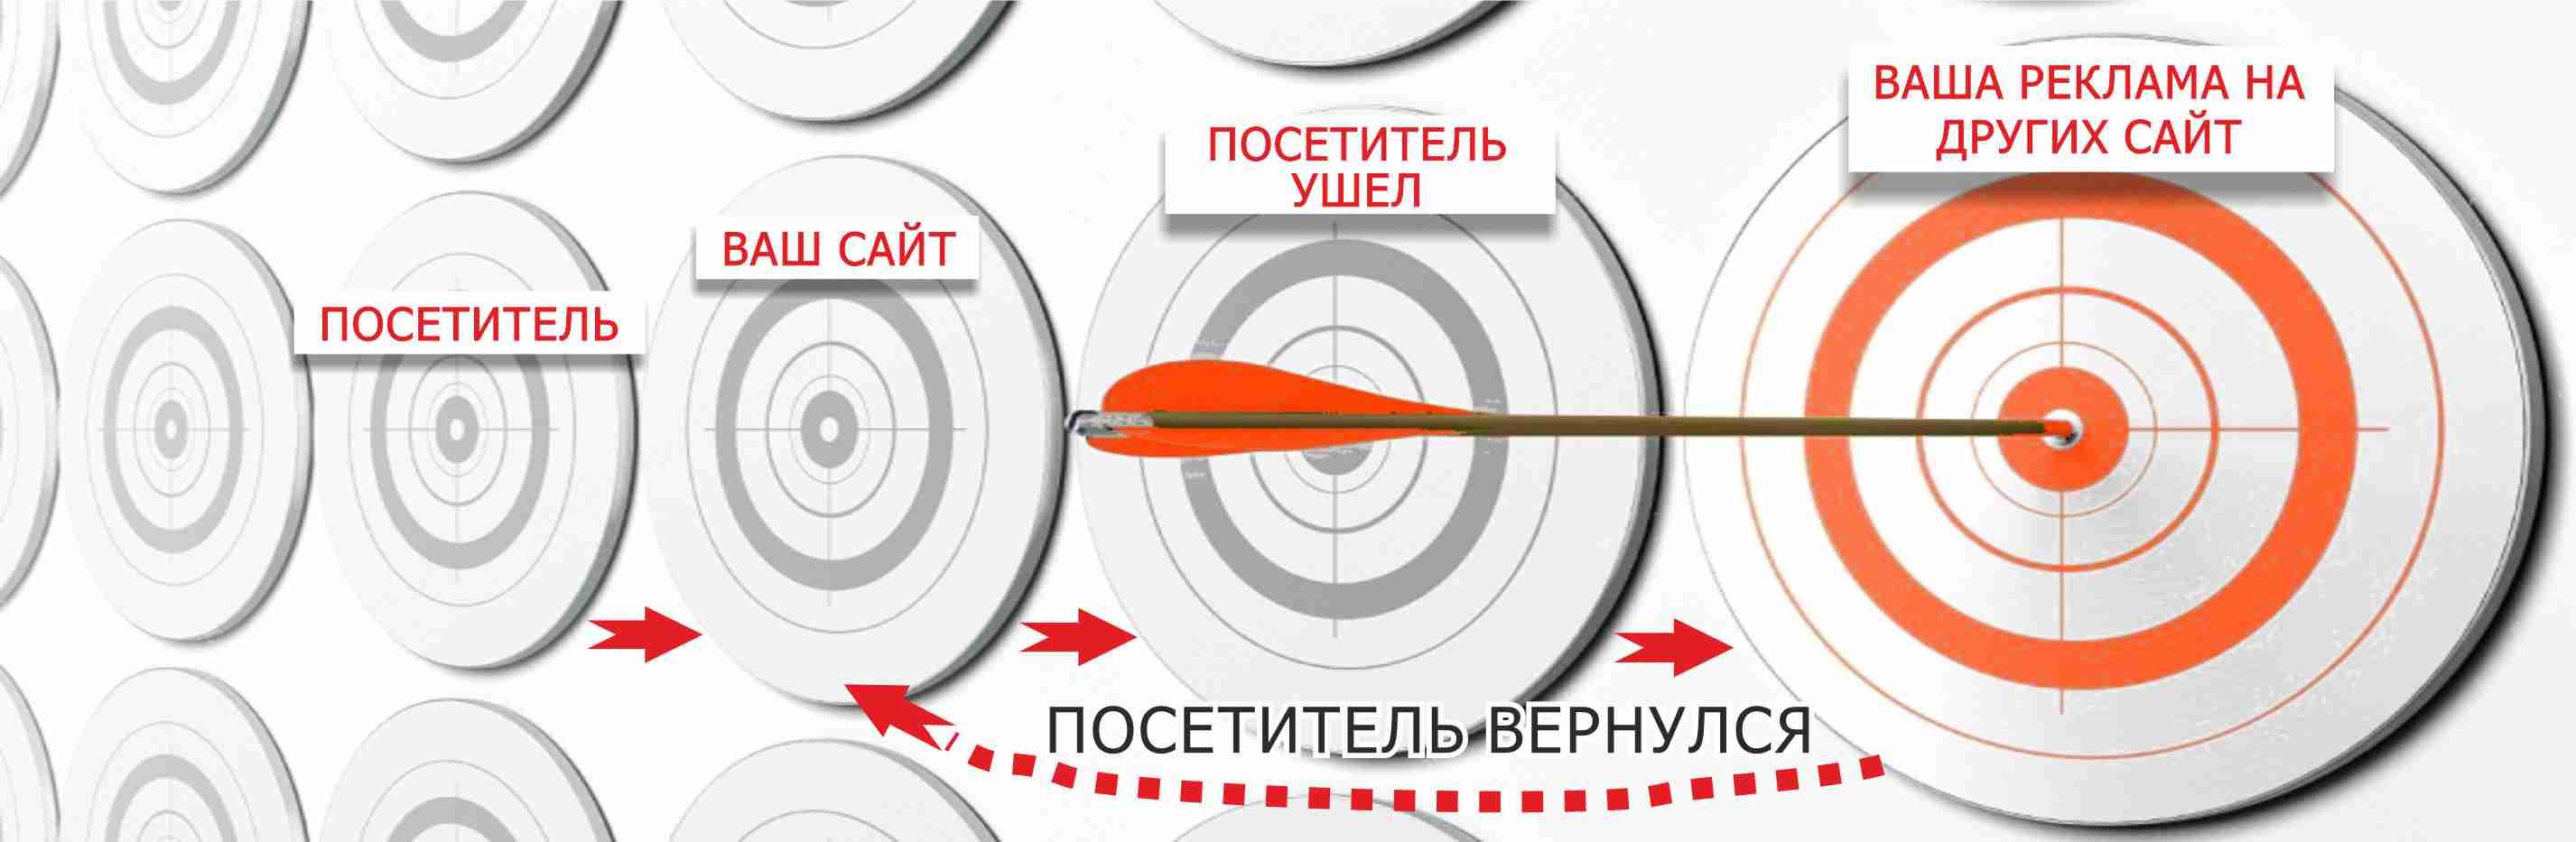 Ремаркетинг reklama-on.by